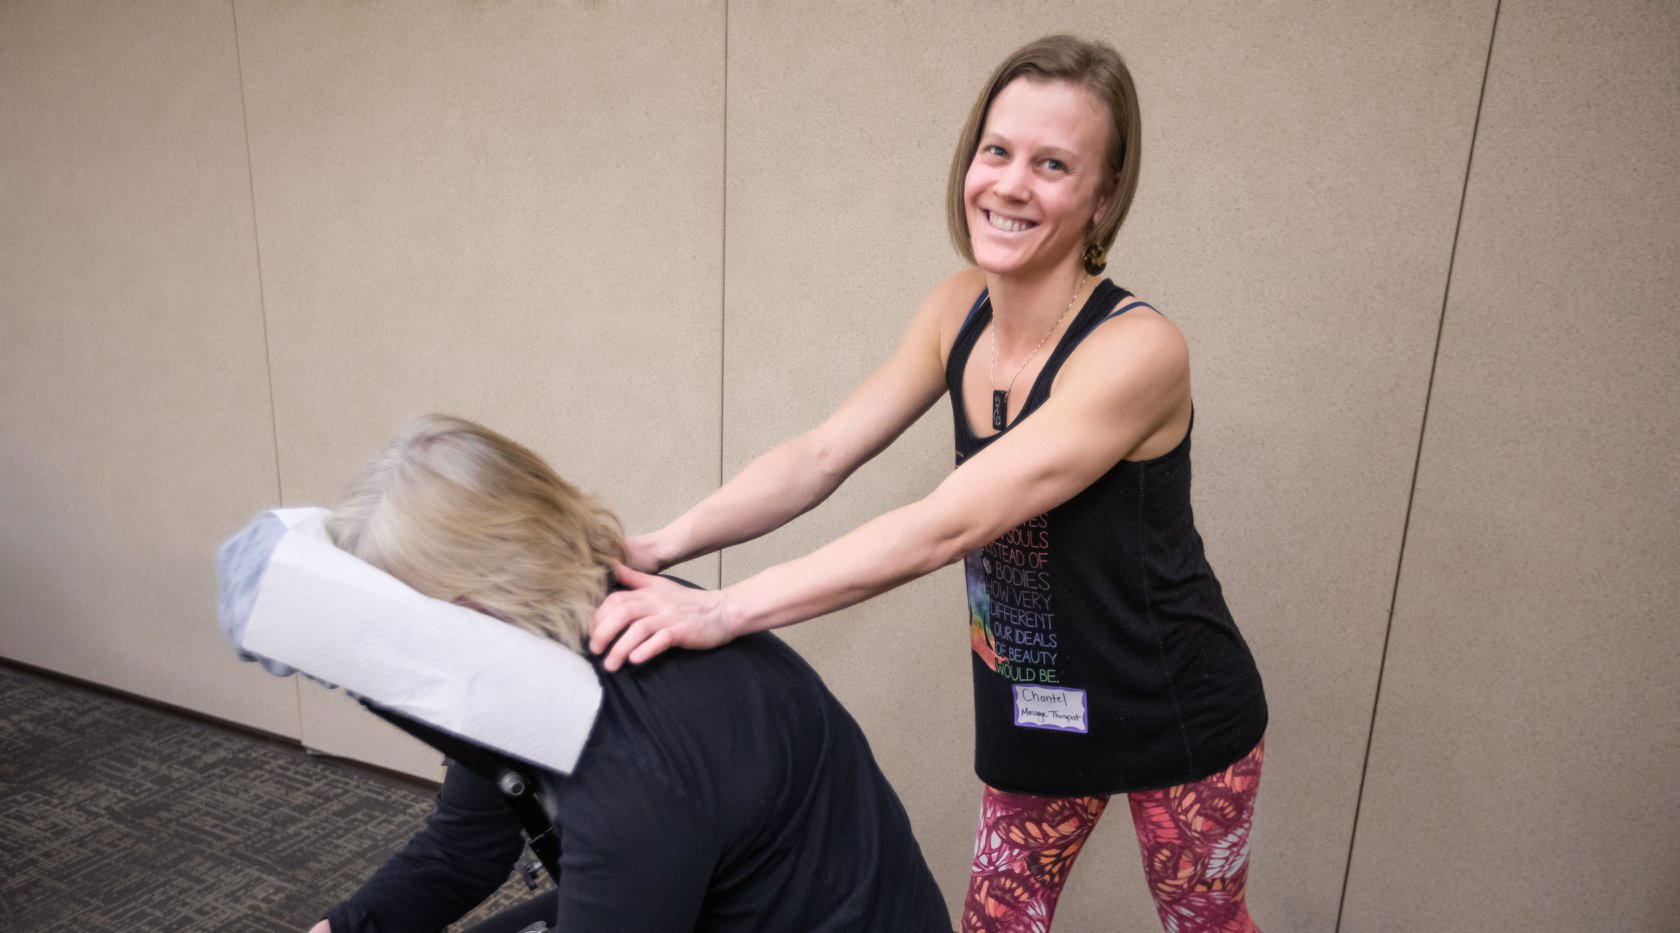 Chair Massage at Vail Valley Partnership